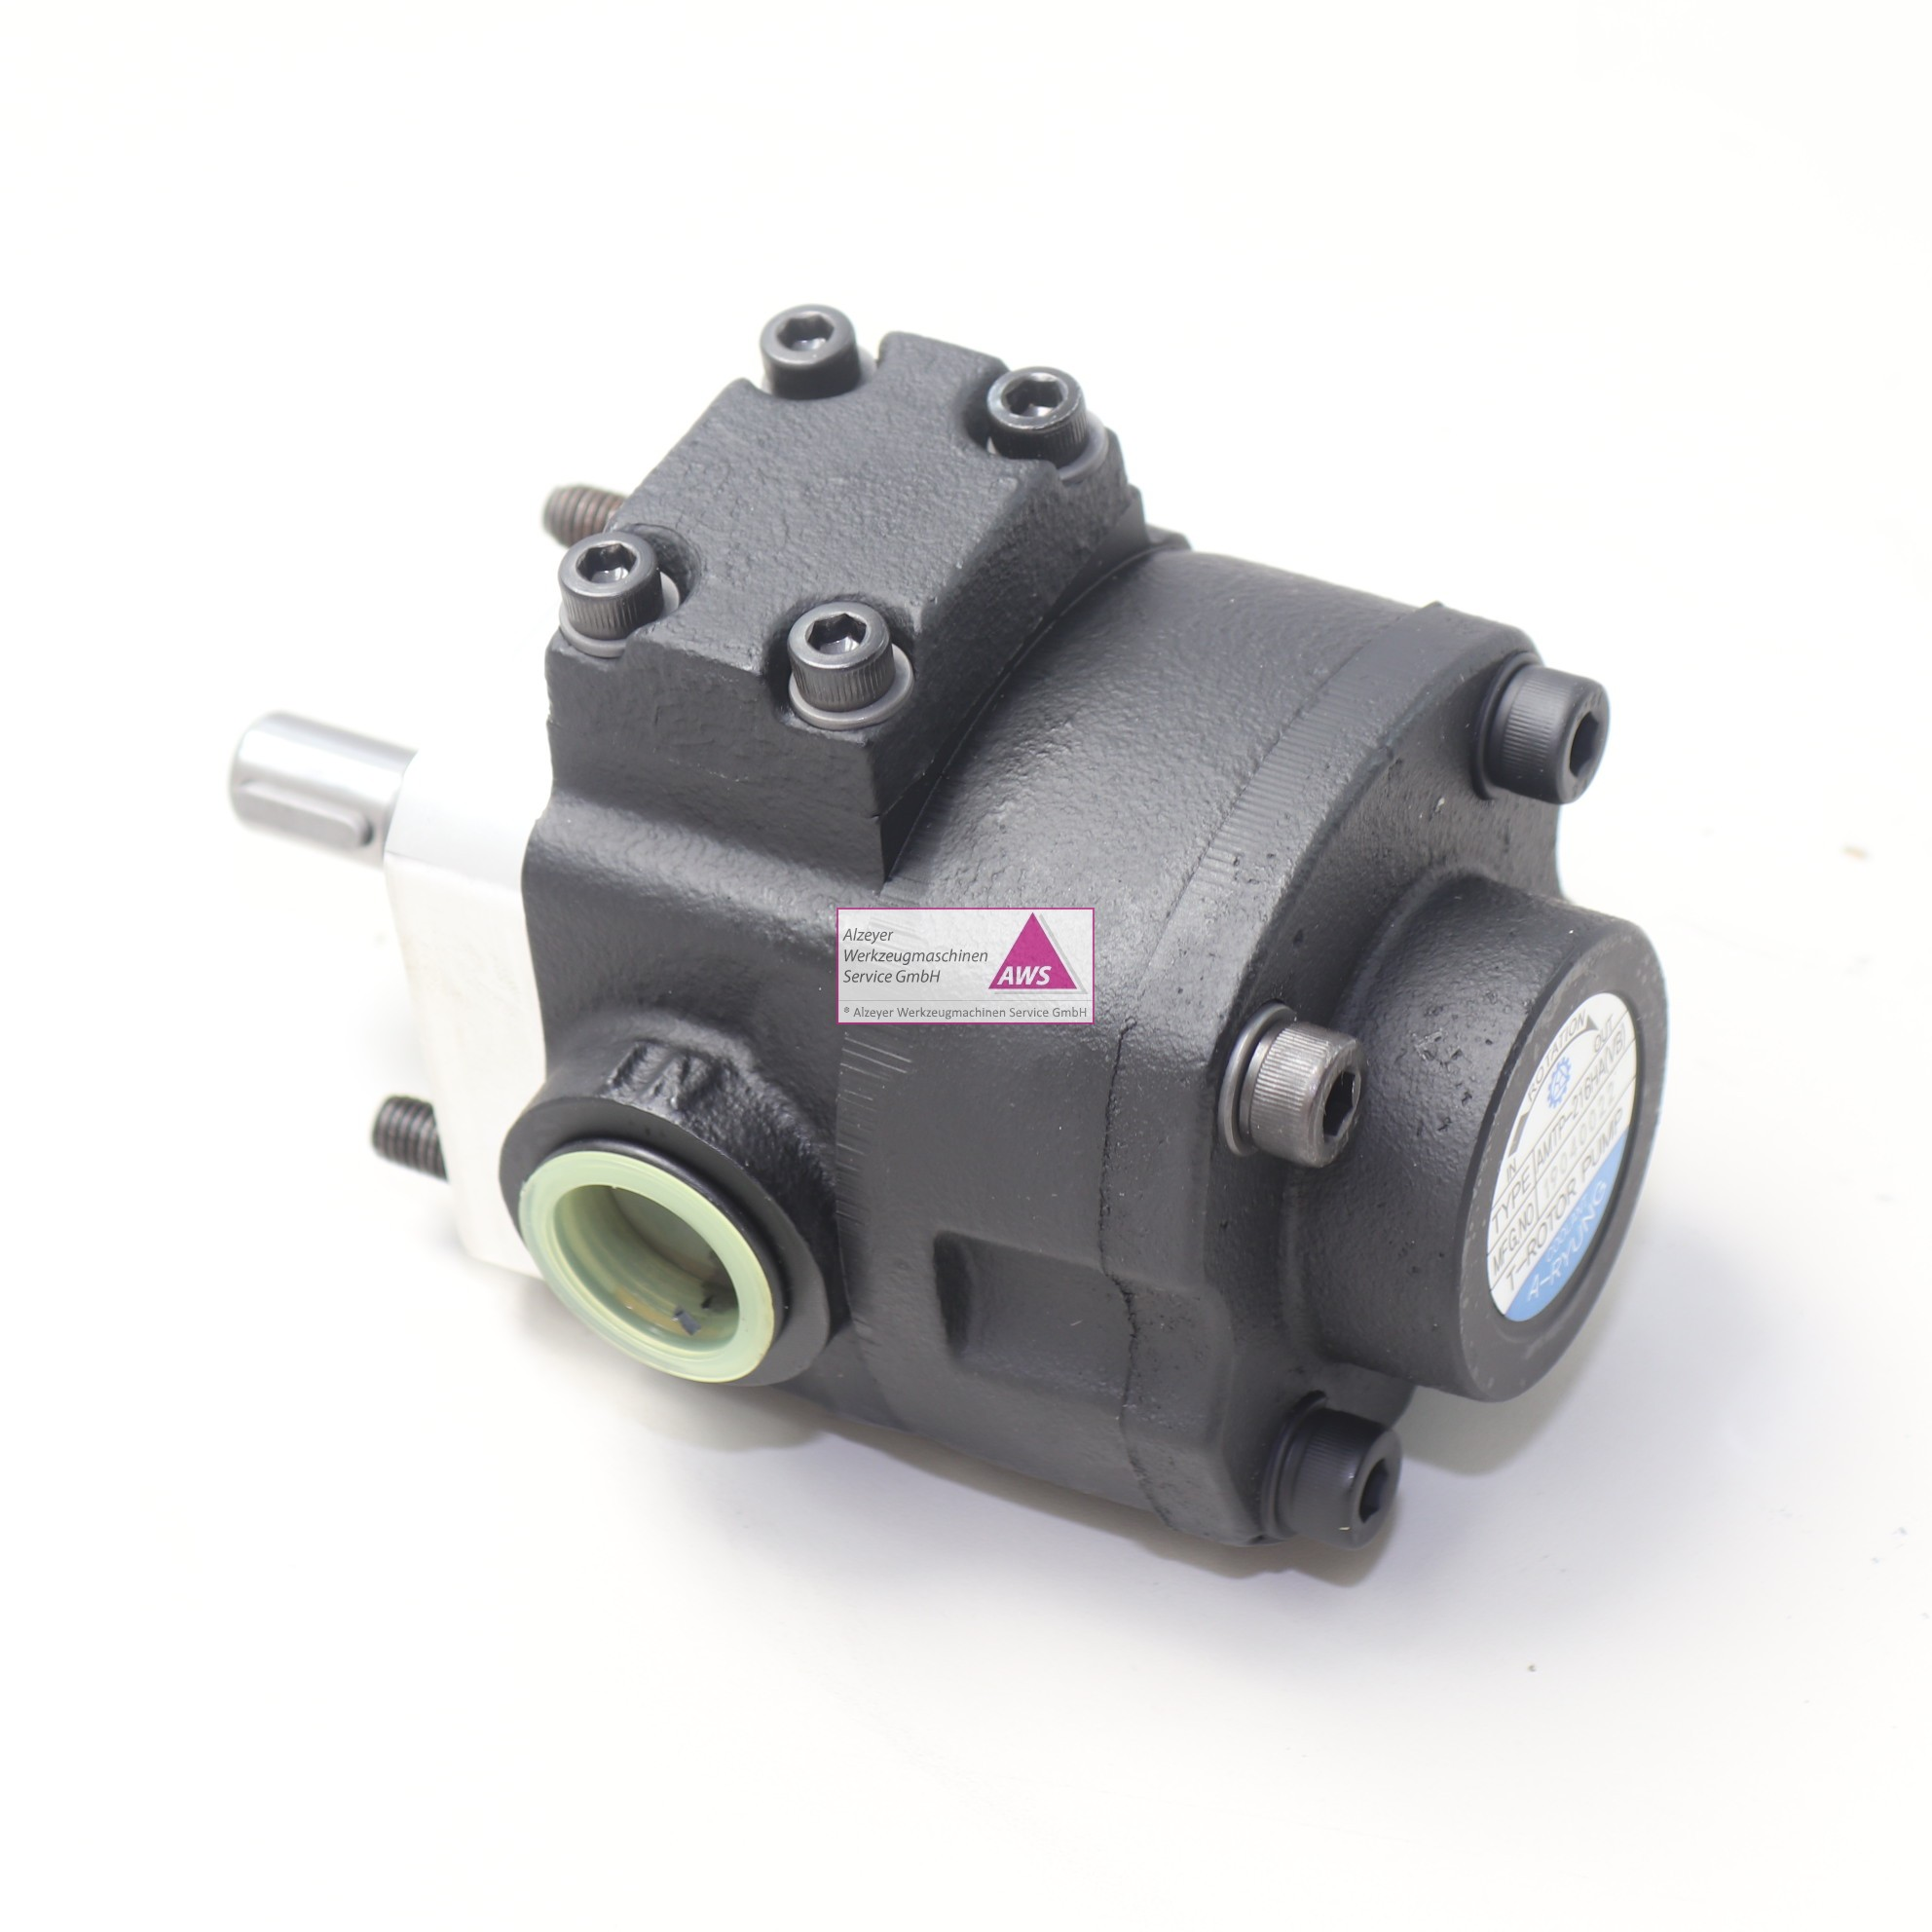 Pumpe T-Rotor 216 HWM